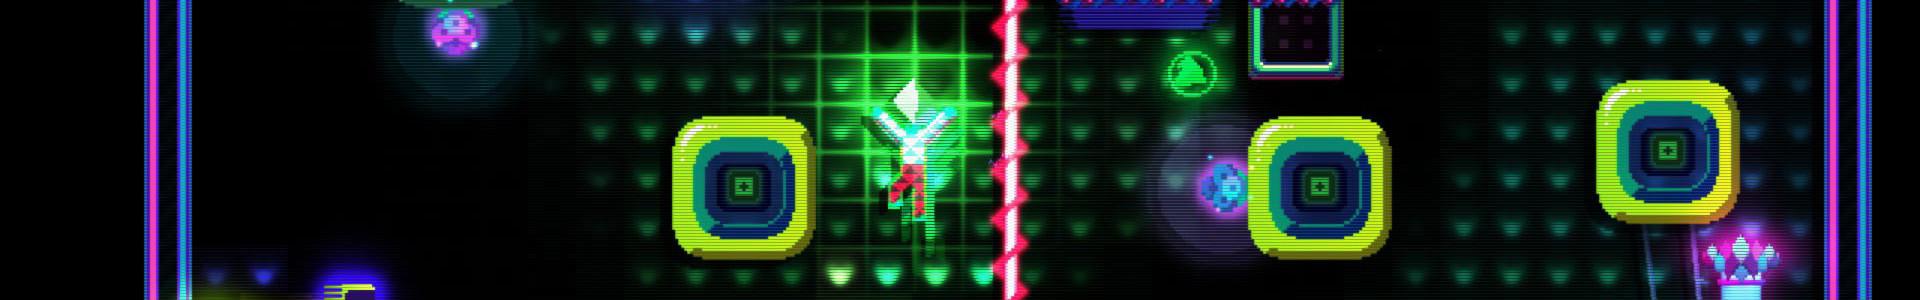 Banner media of Octahedron video game.